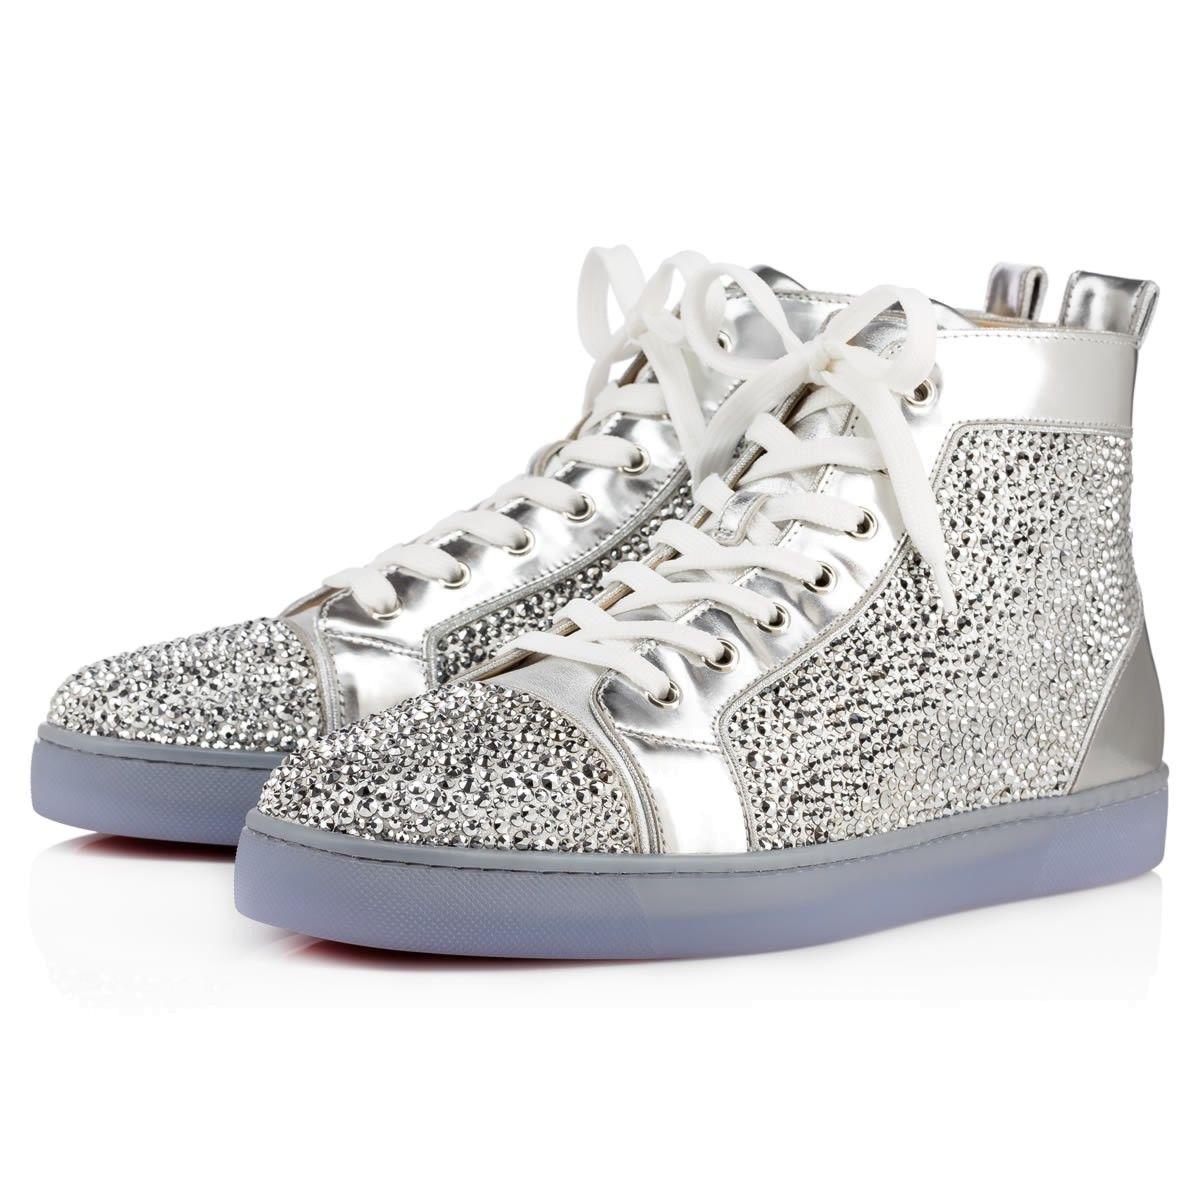 2d150df8fca3 LOUIS NAPPA LAMINATO STRASS Silver Strass - Men Shoes - Christian Louboutin